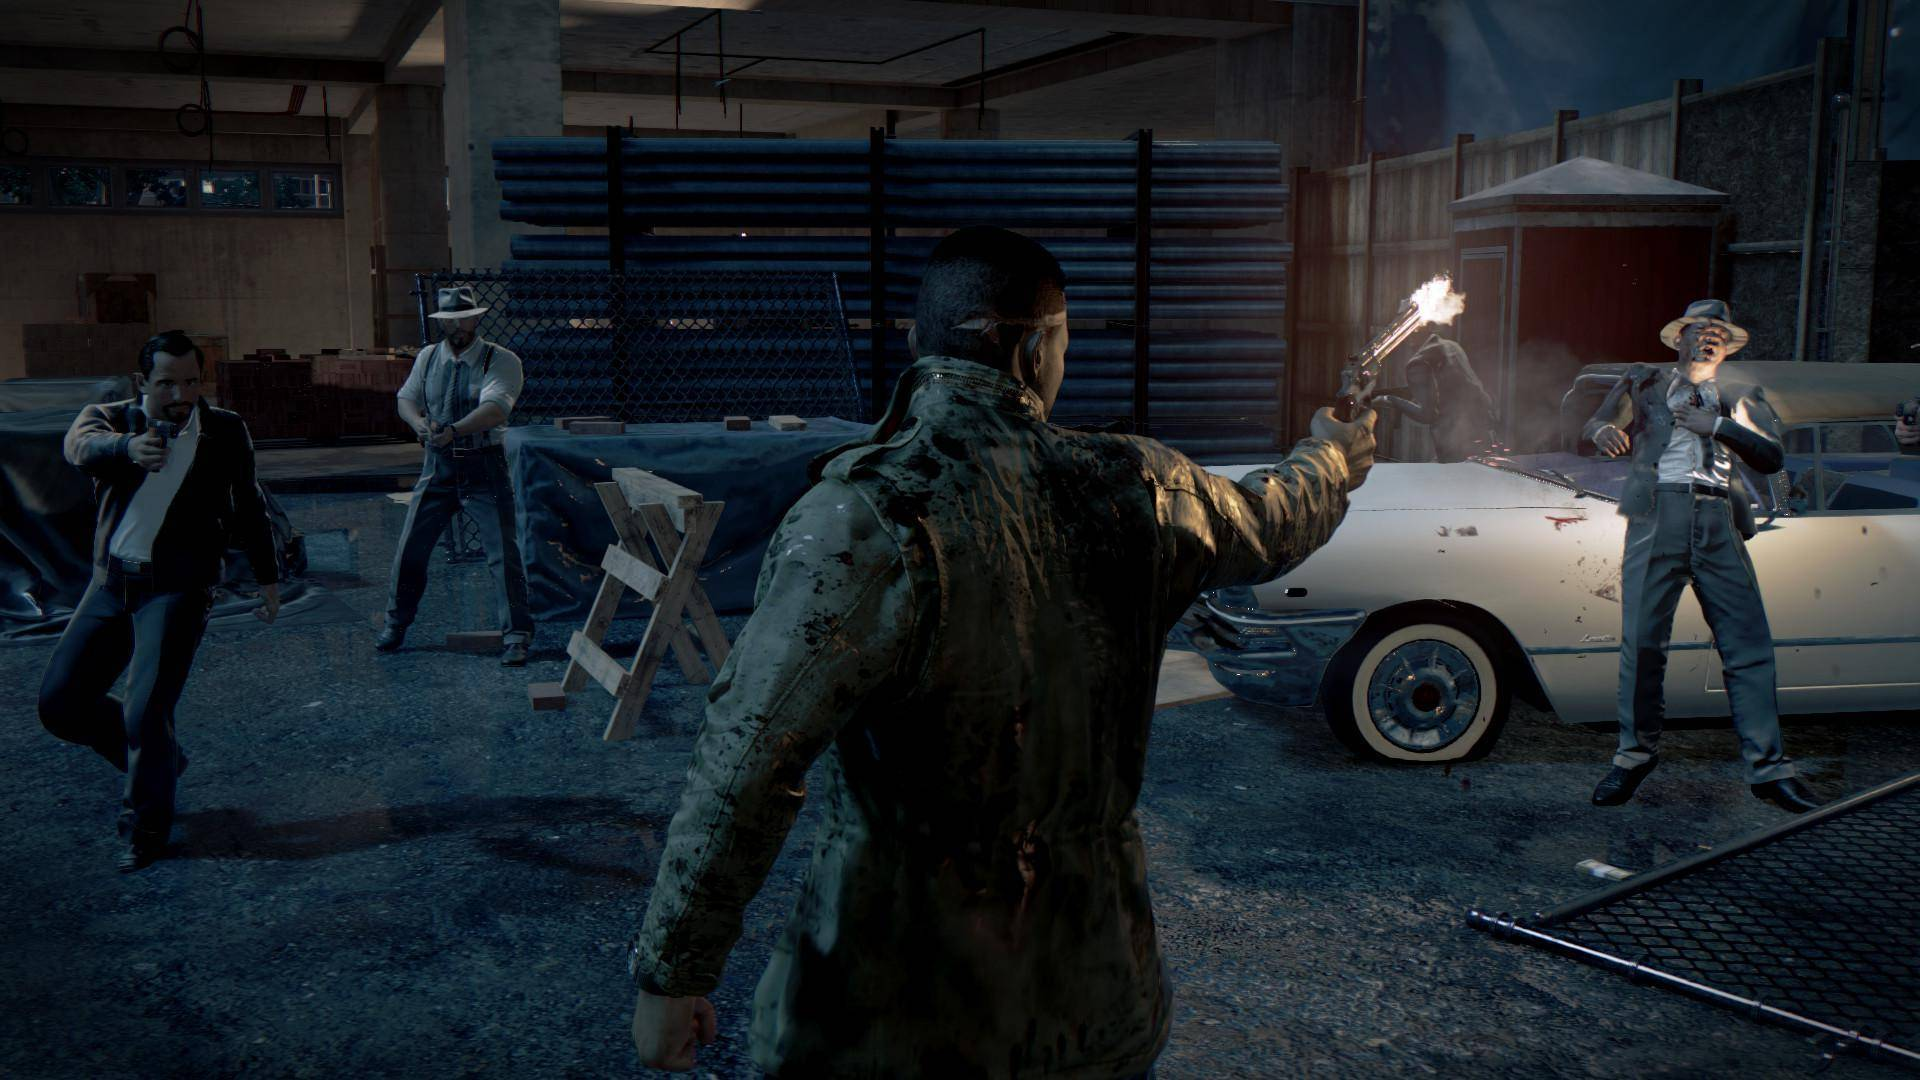 Mafia 3 Ps4 Kaufen Preisvergleich Game Steep  Reg Titel Des Artikels Bermafia